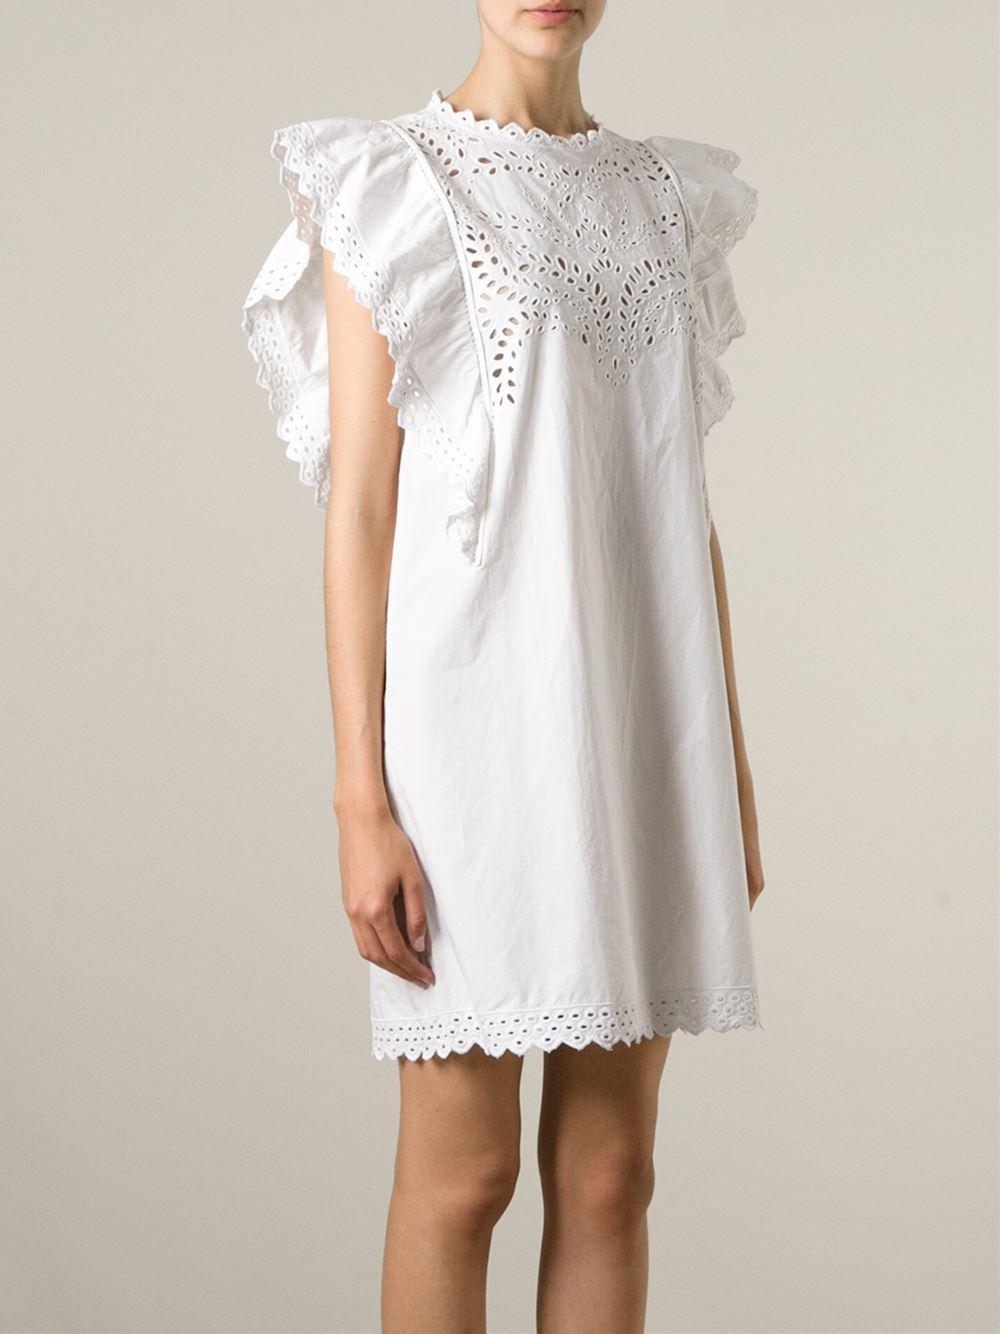 lyst toile isabel marant 39 scarla 39 dress in white. Black Bedroom Furniture Sets. Home Design Ideas